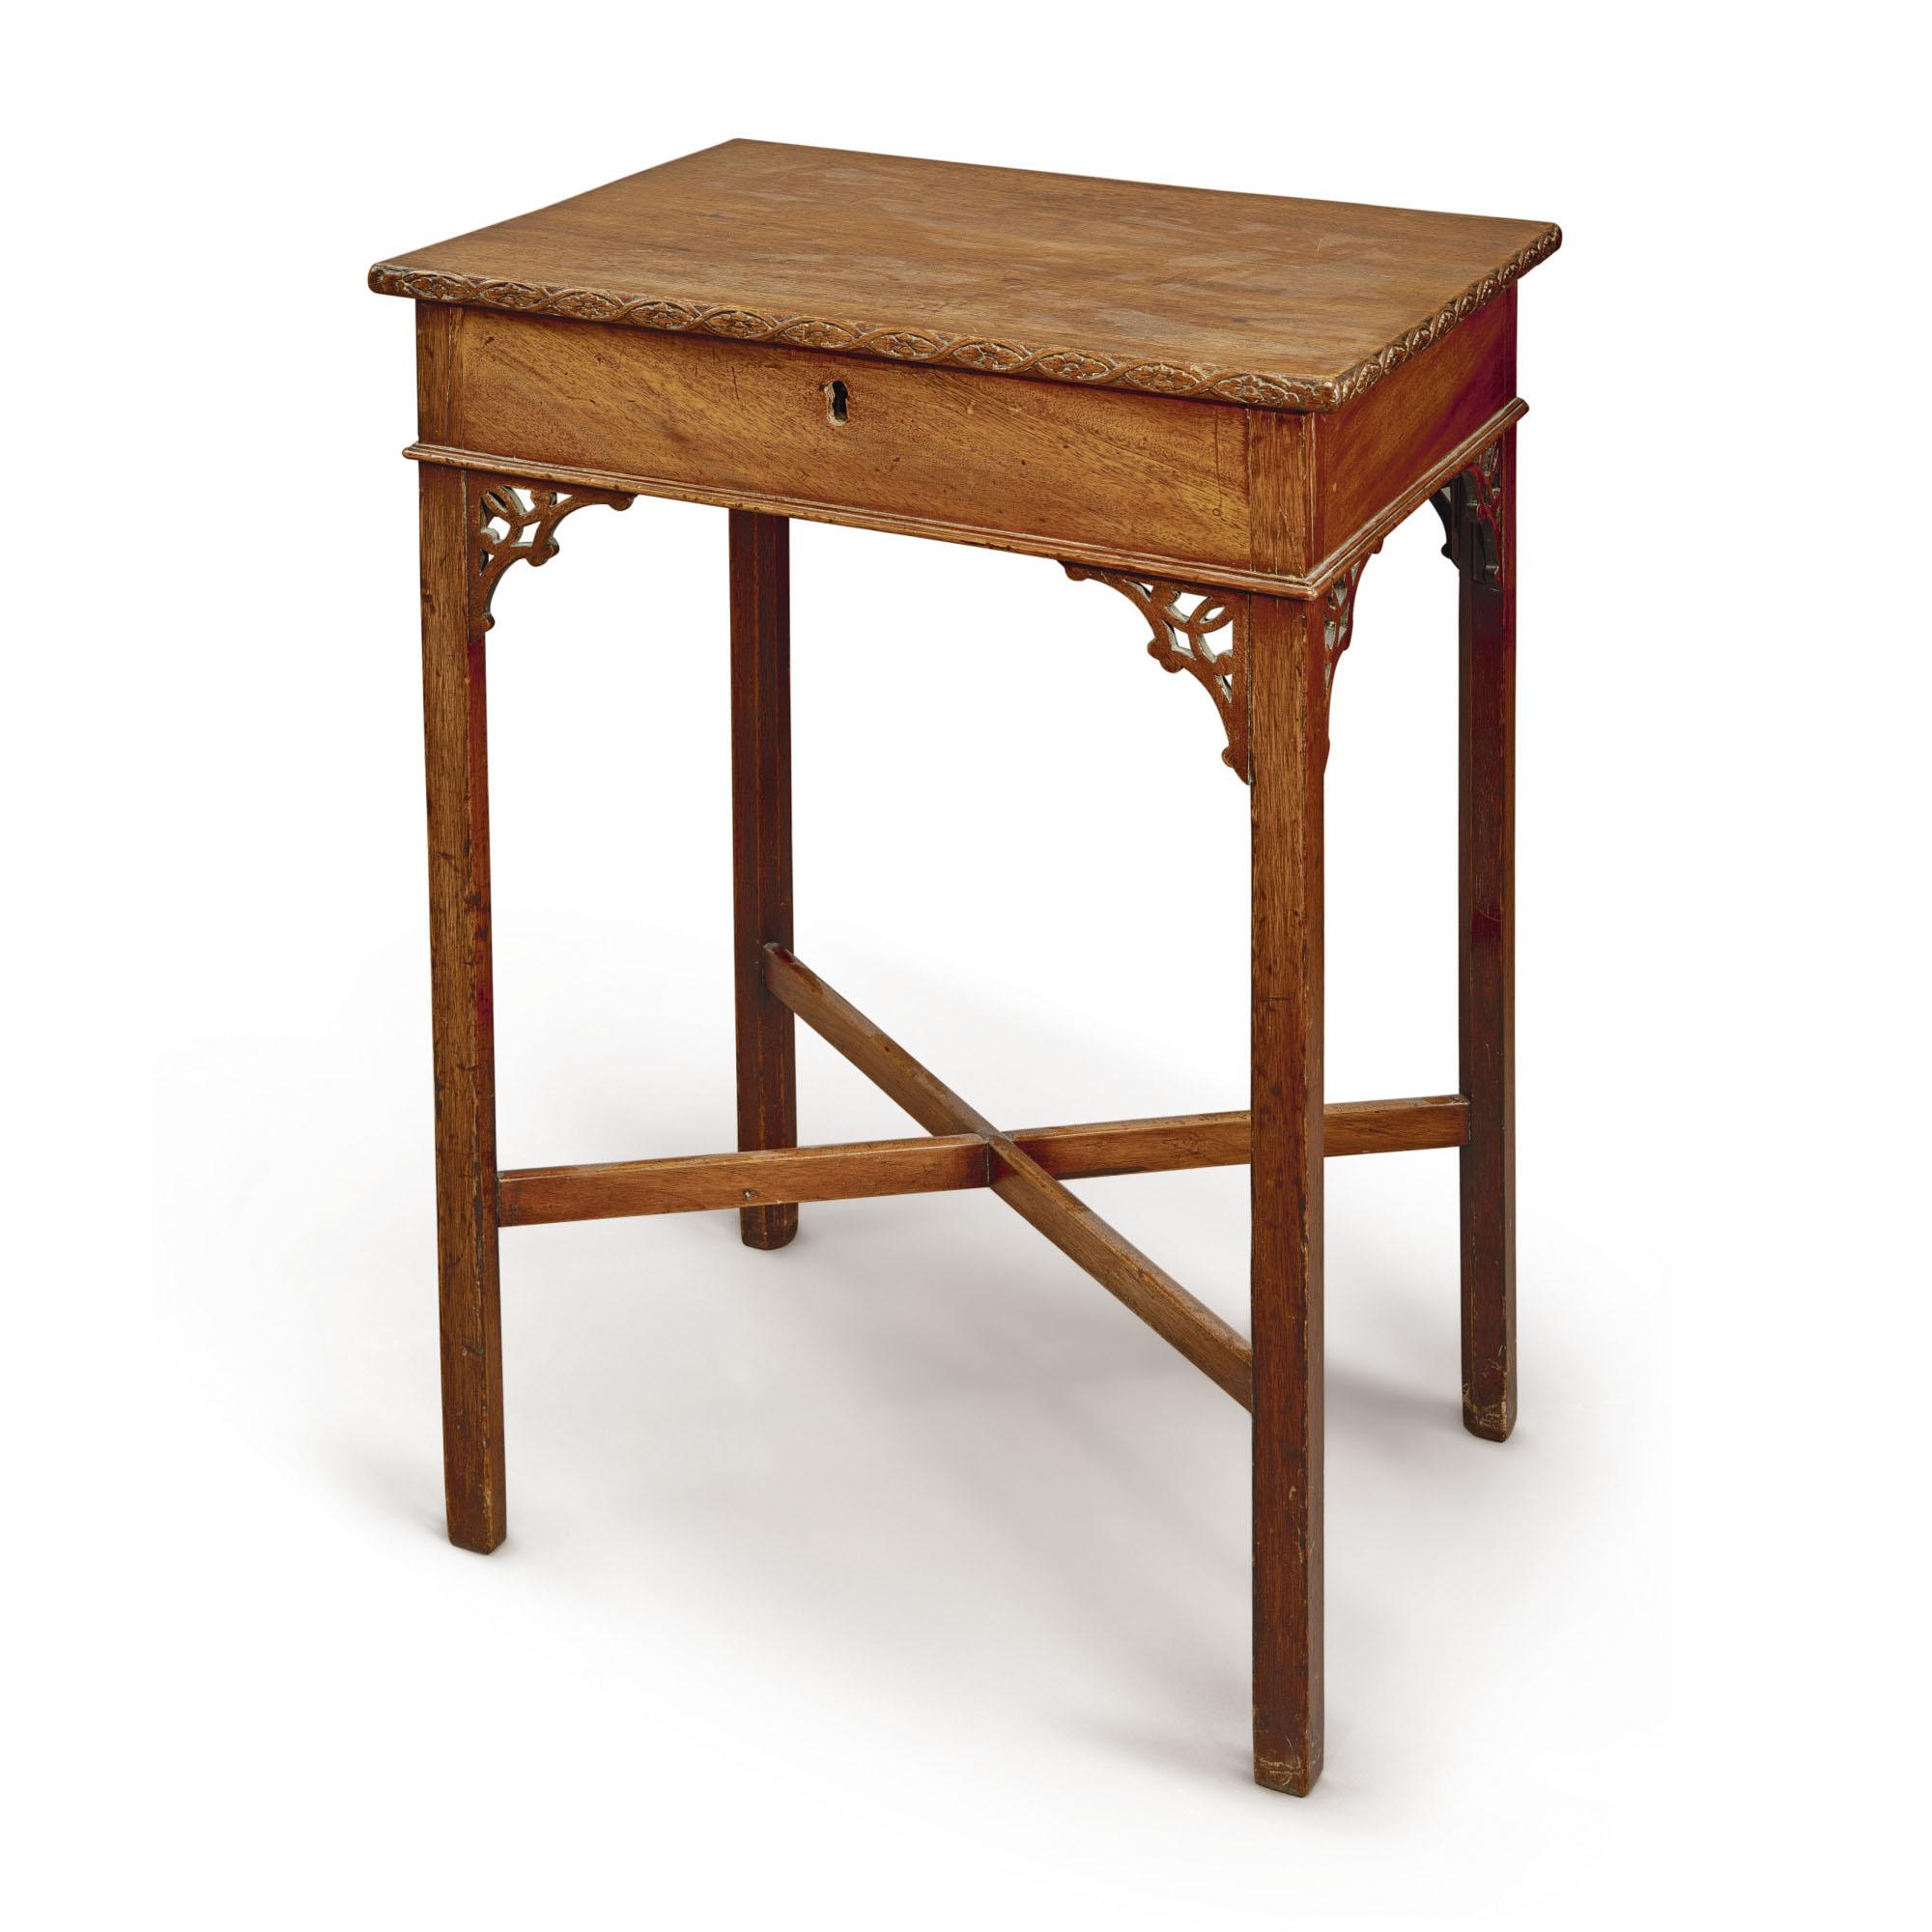 A GEORGE III MAHOGANY SIDE TABLE, THIRD QUARTER 18TH CENTURY